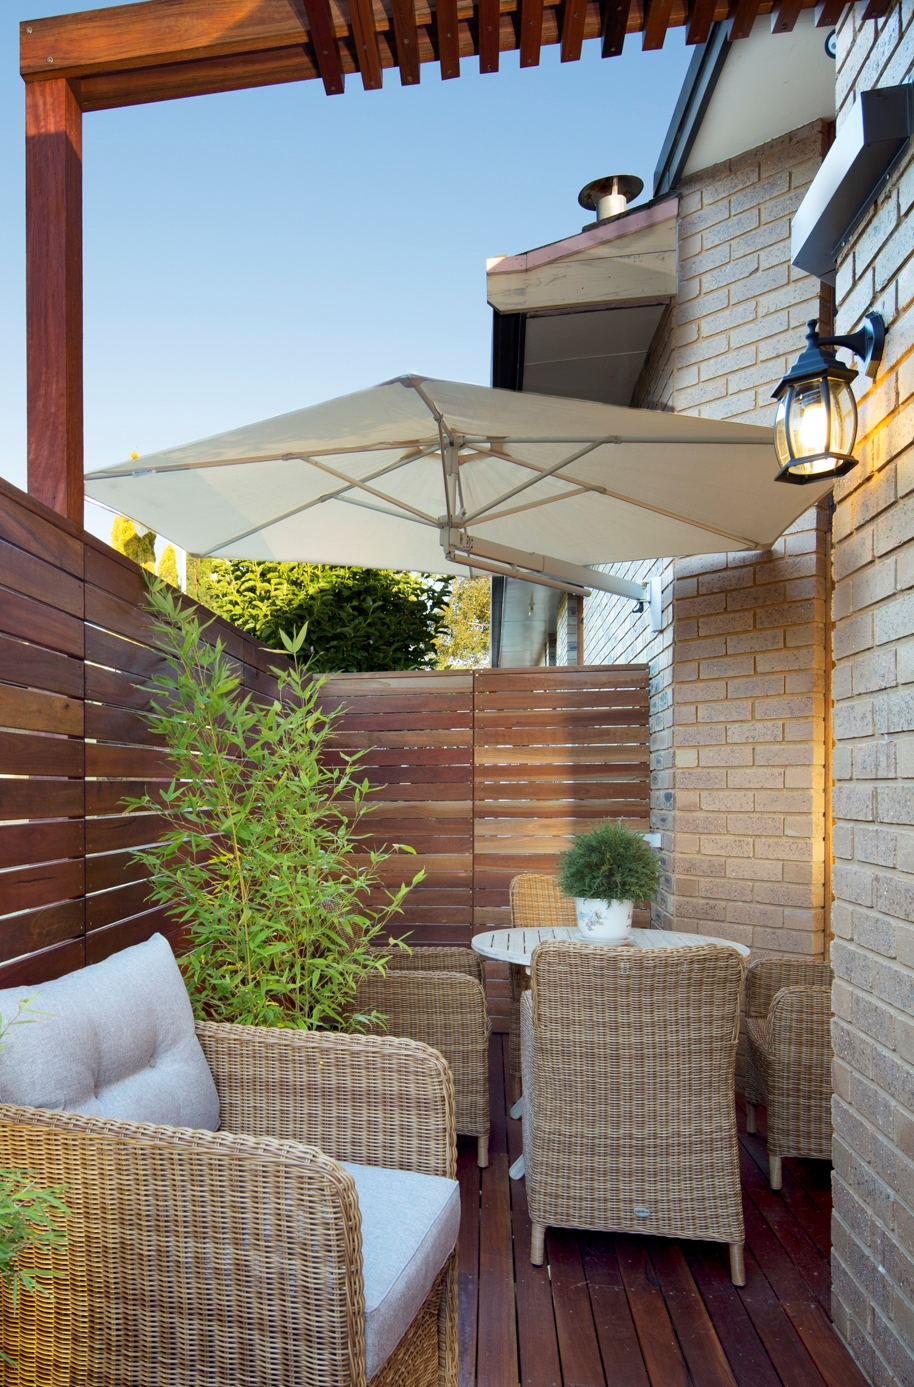 wall mounted umbrellas cantilever outdoor umbrellas sydney shade. Black Bedroom Furniture Sets. Home Design Ideas